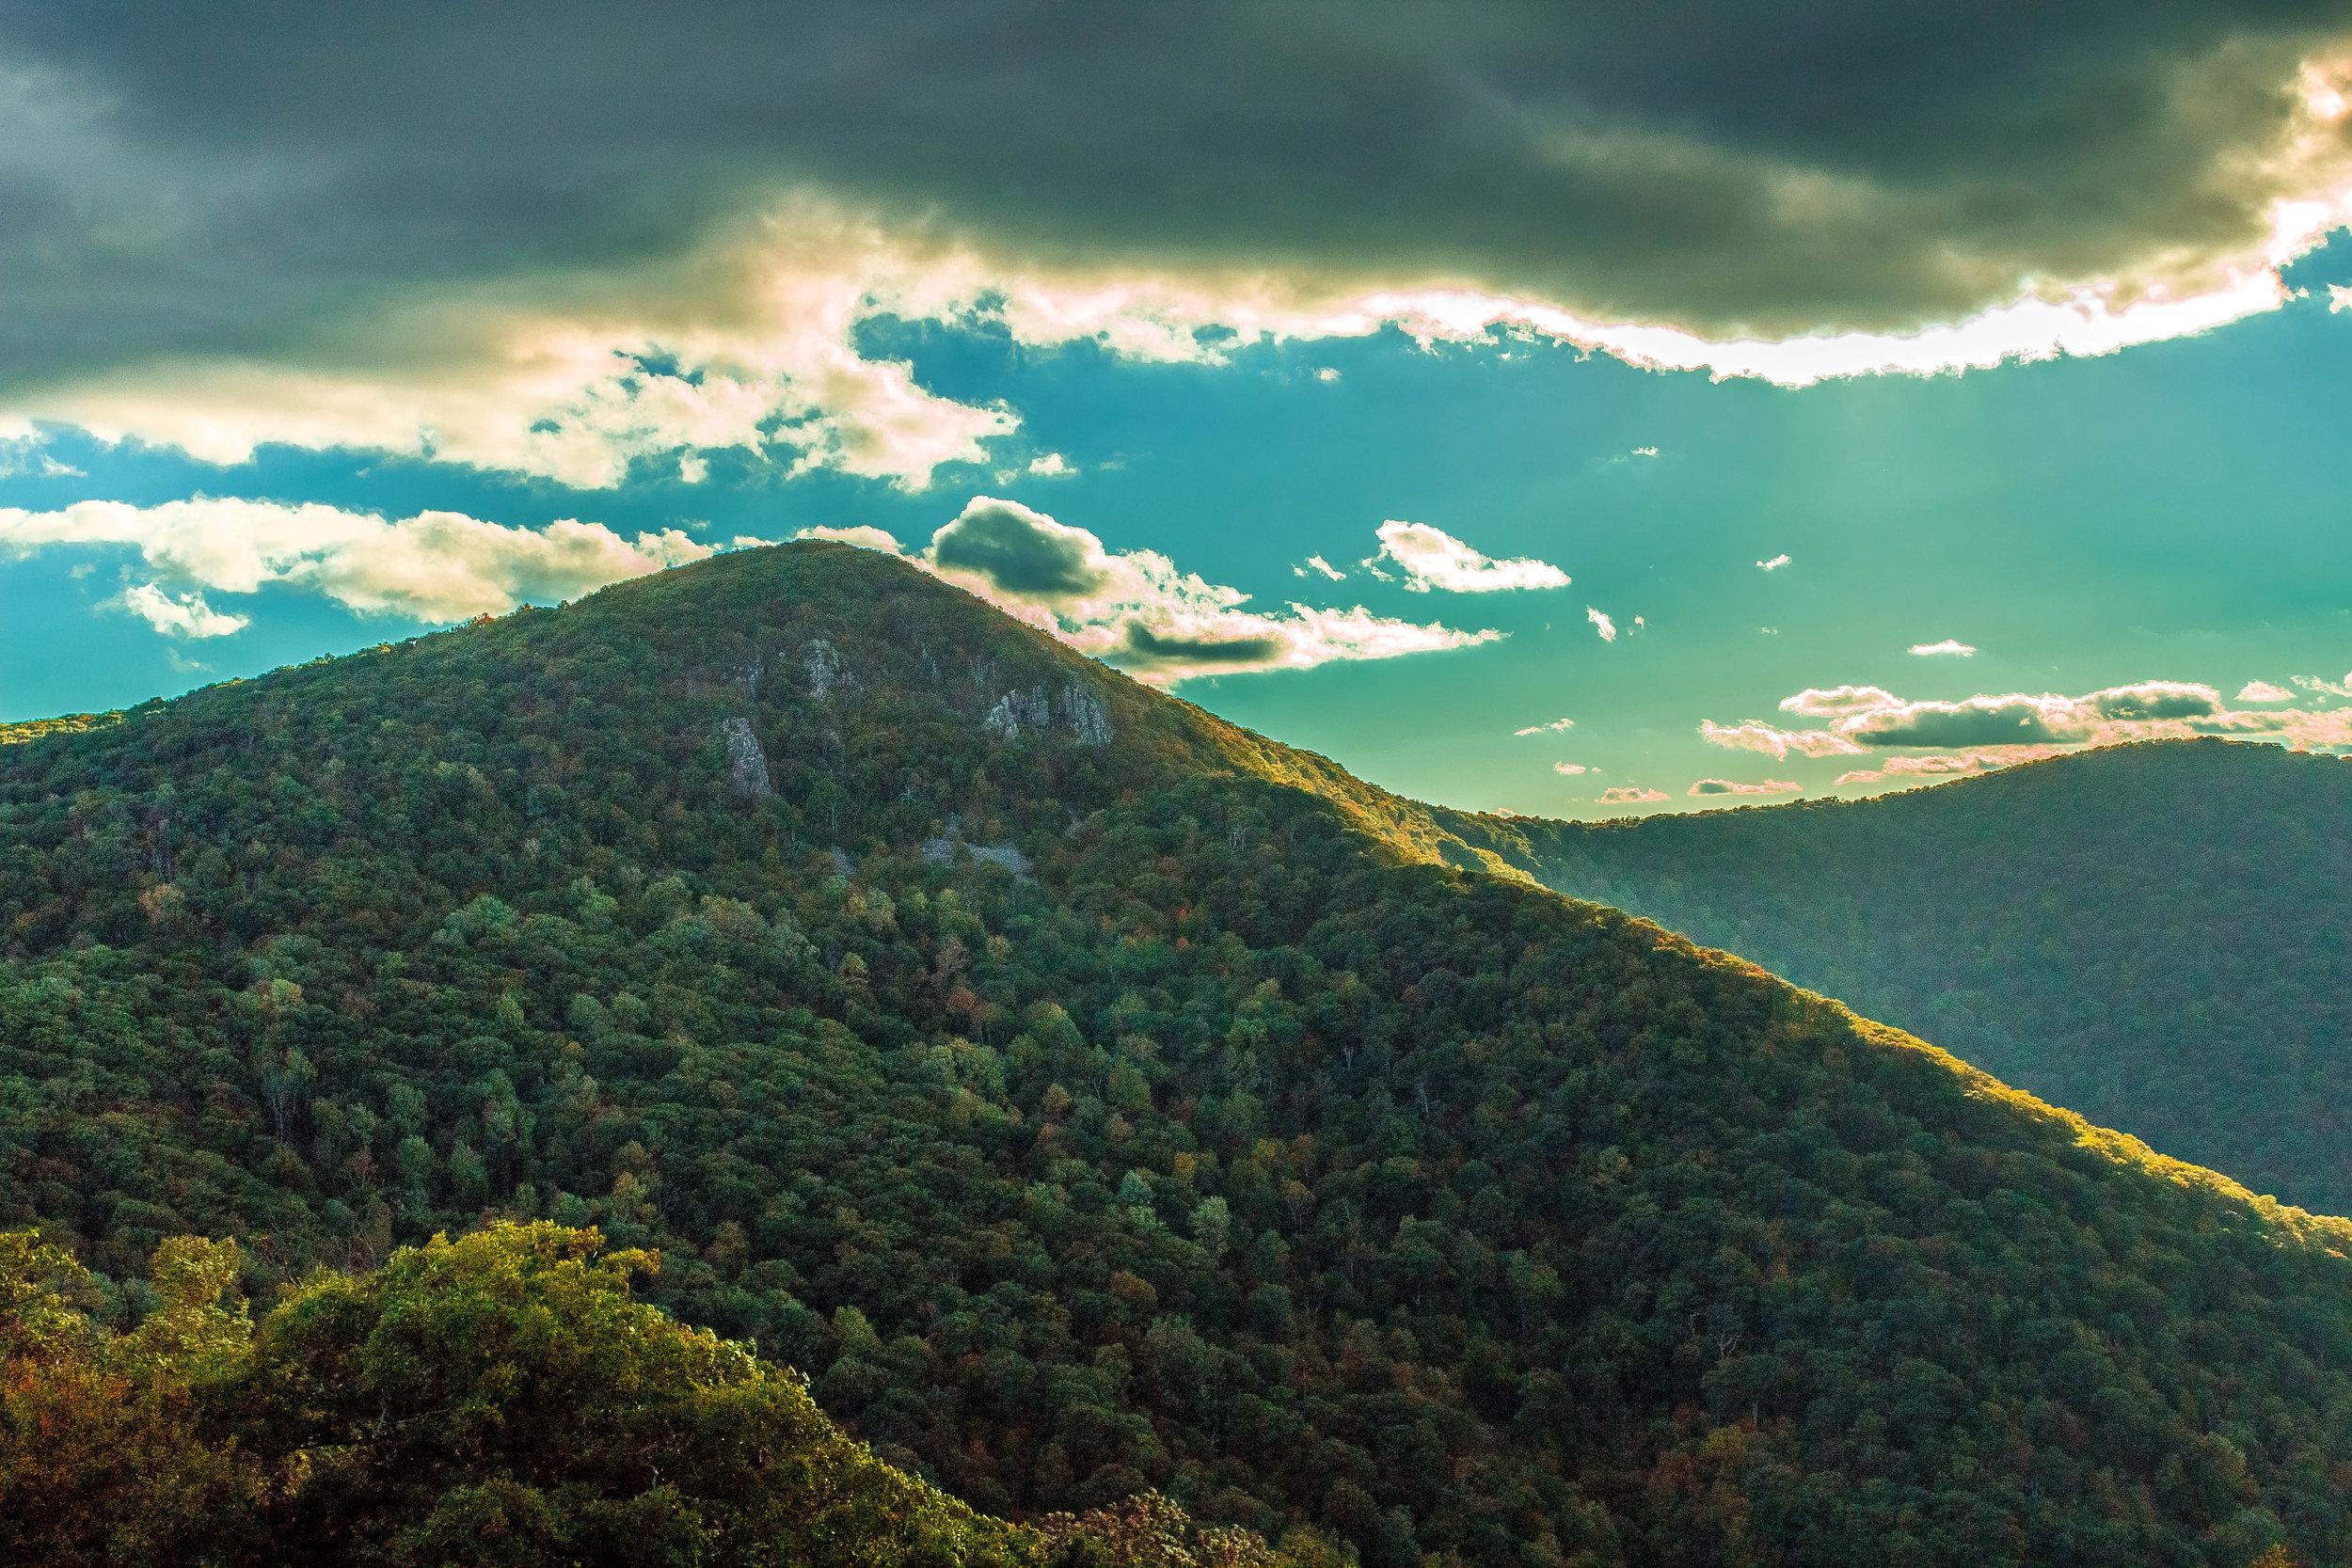 Mountain in Shenandoah National Park, Viriginia